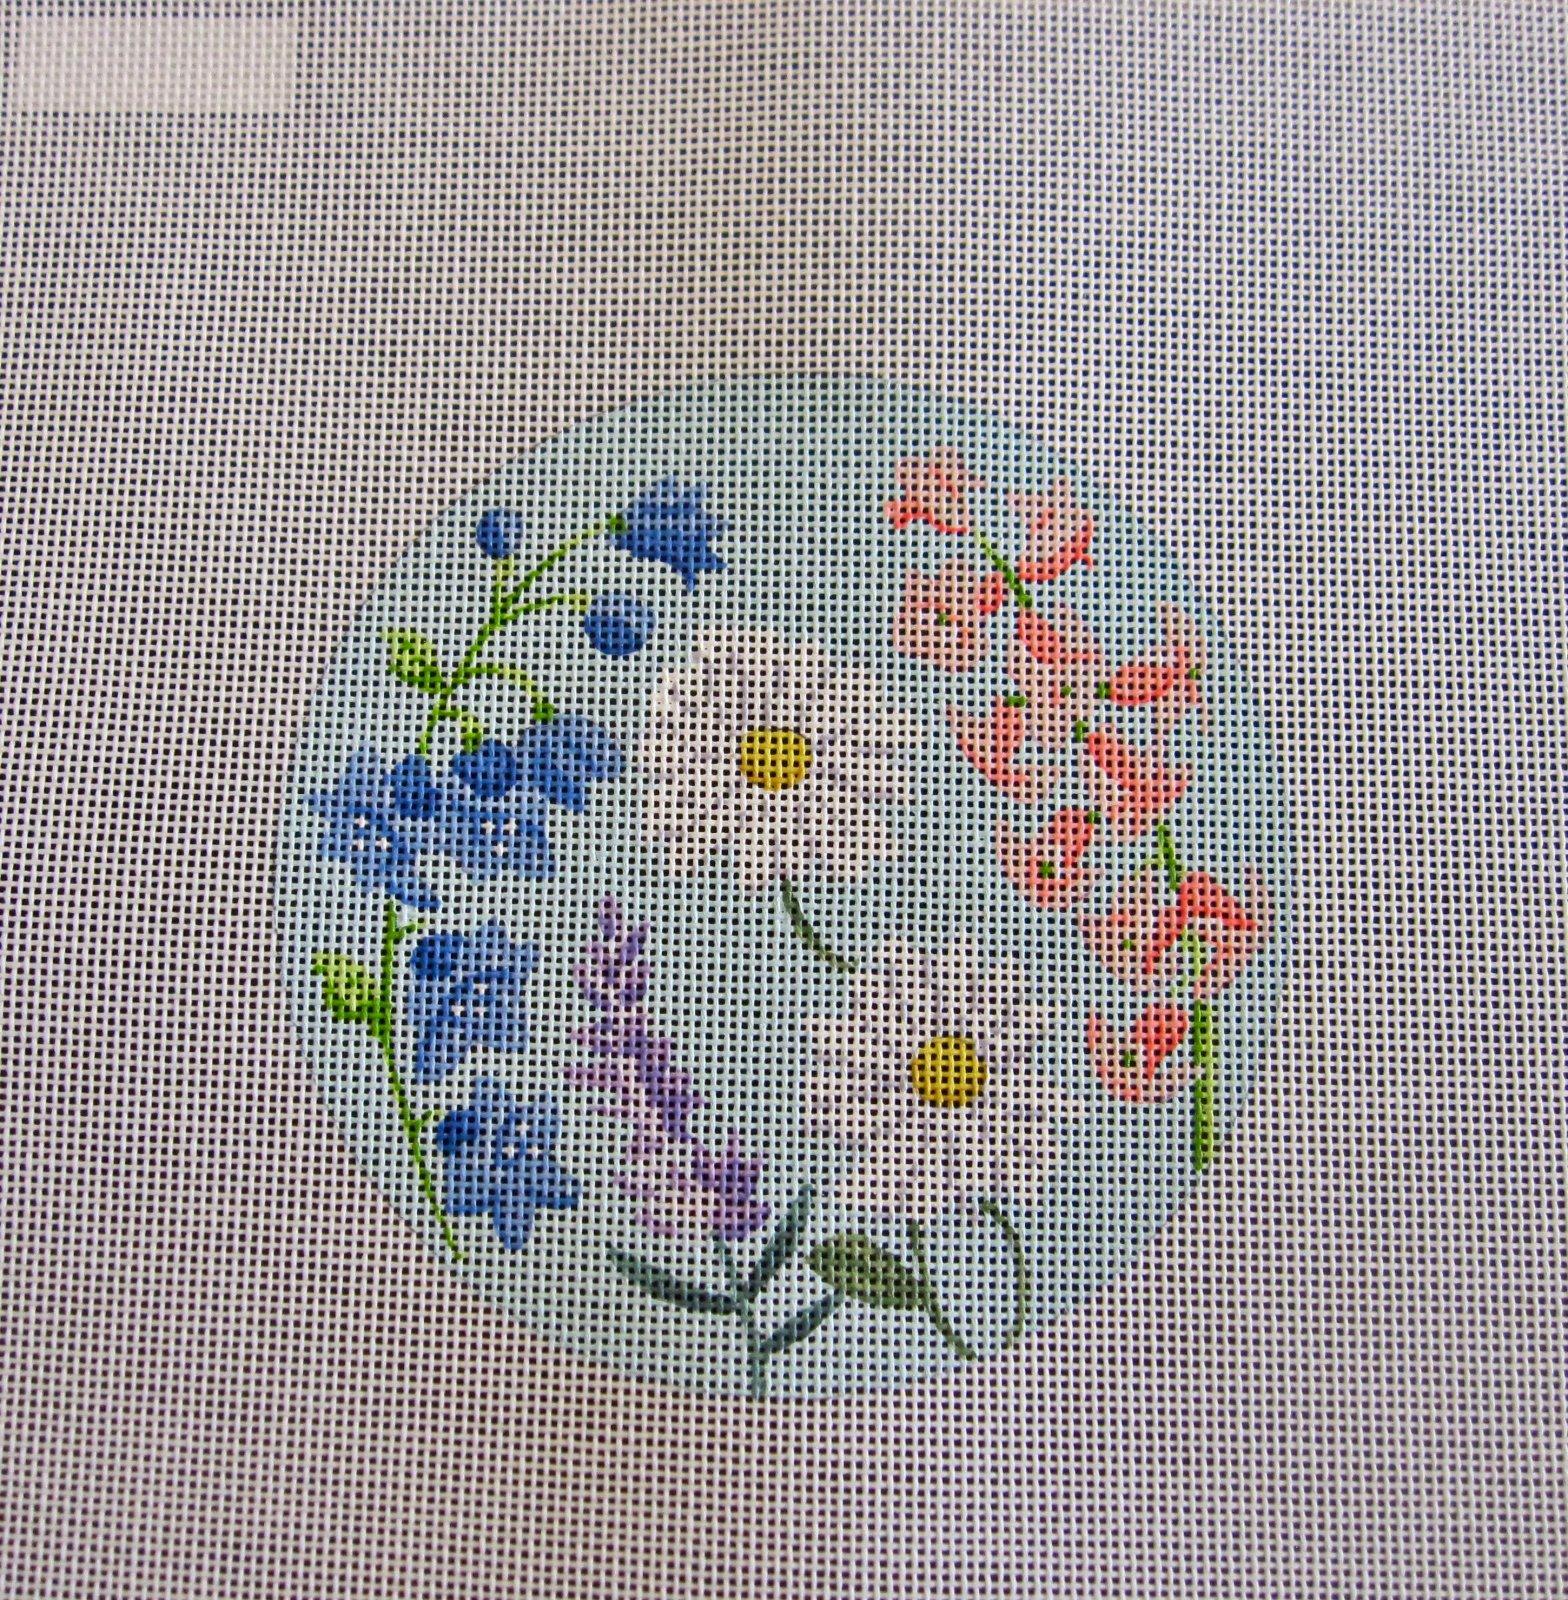 English Garden Round with Daisies